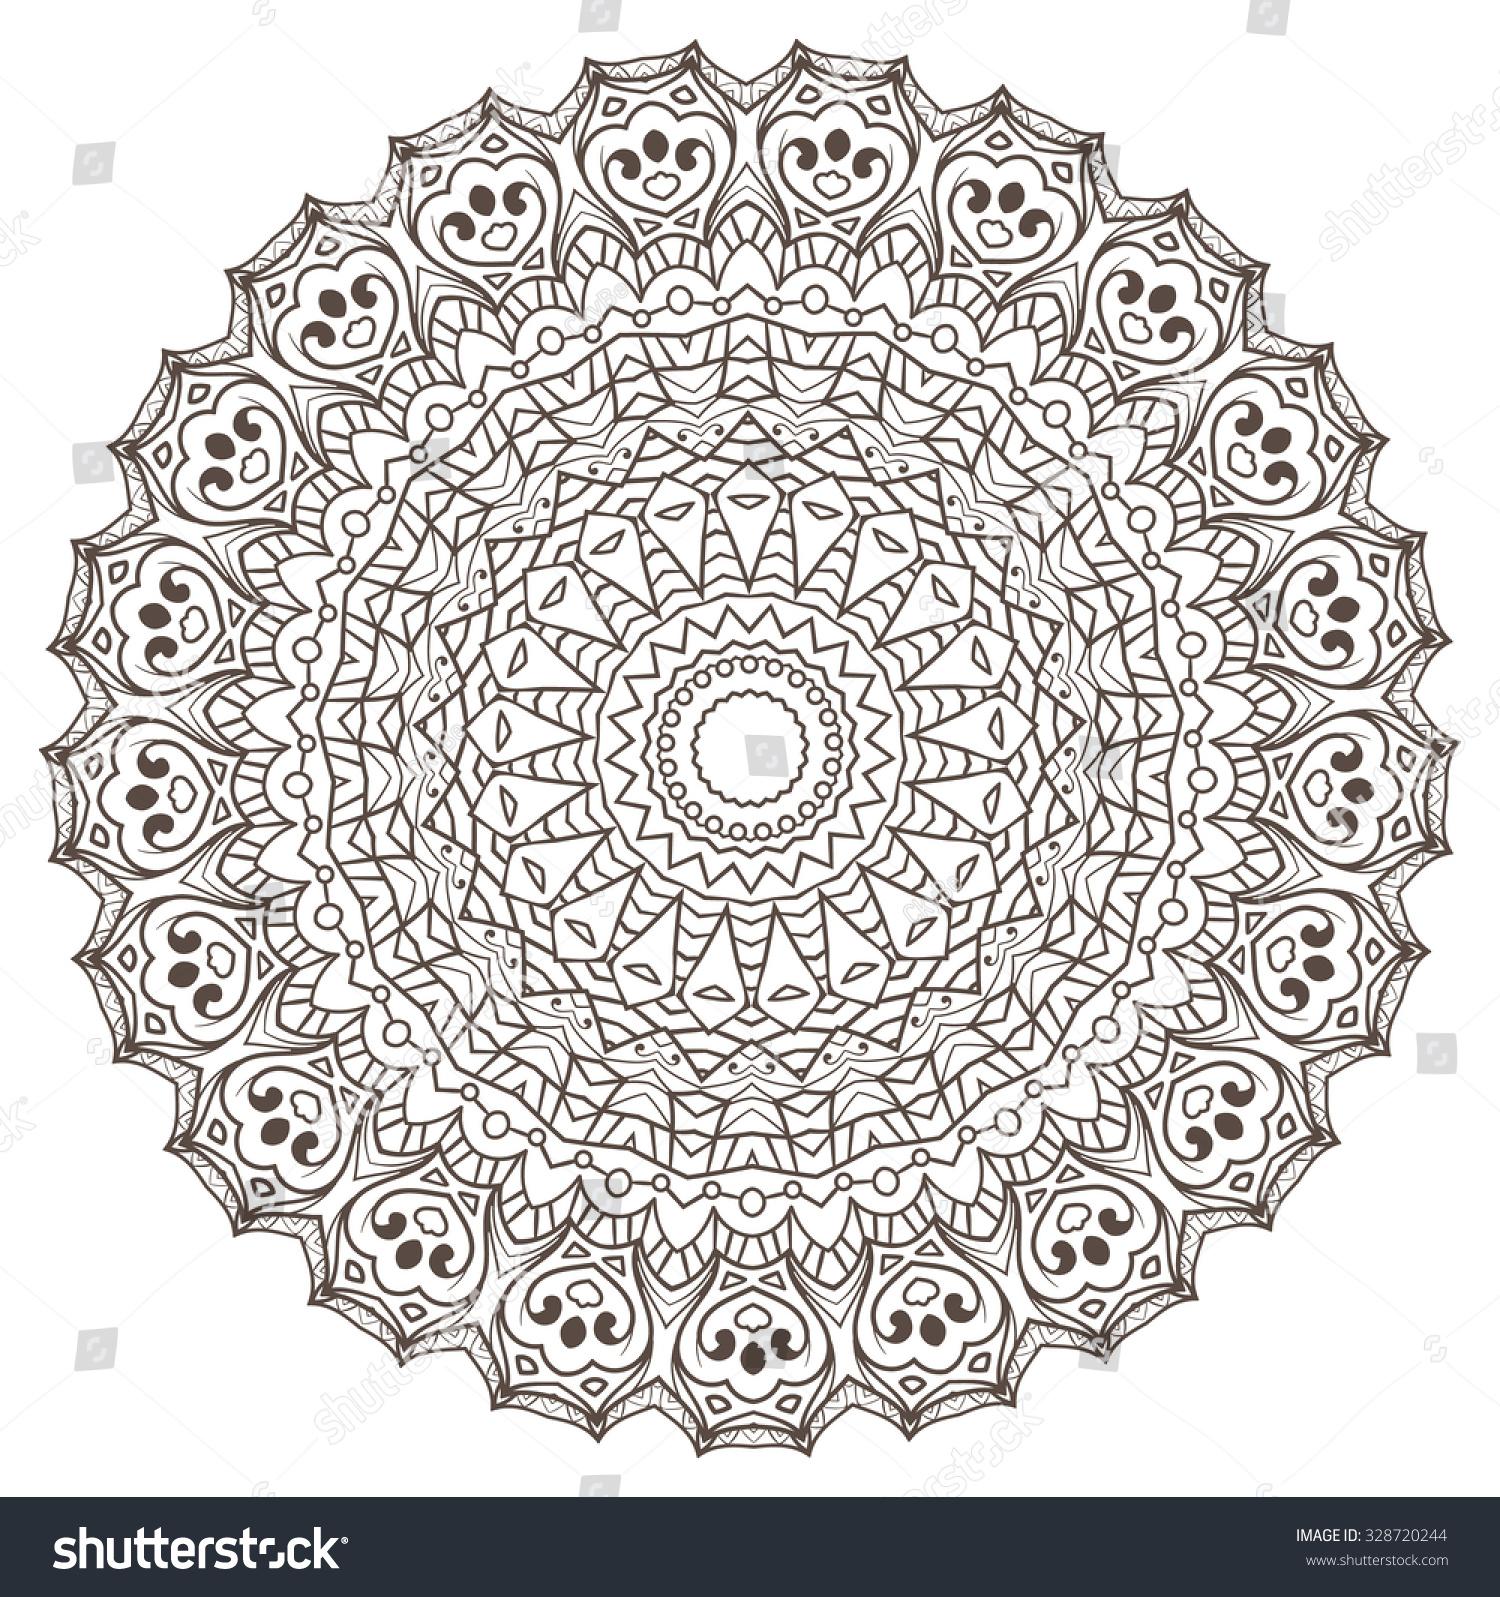 Ethnic Fractal Mandala Vector Meditation Looks Stock Vector (Royalty ...